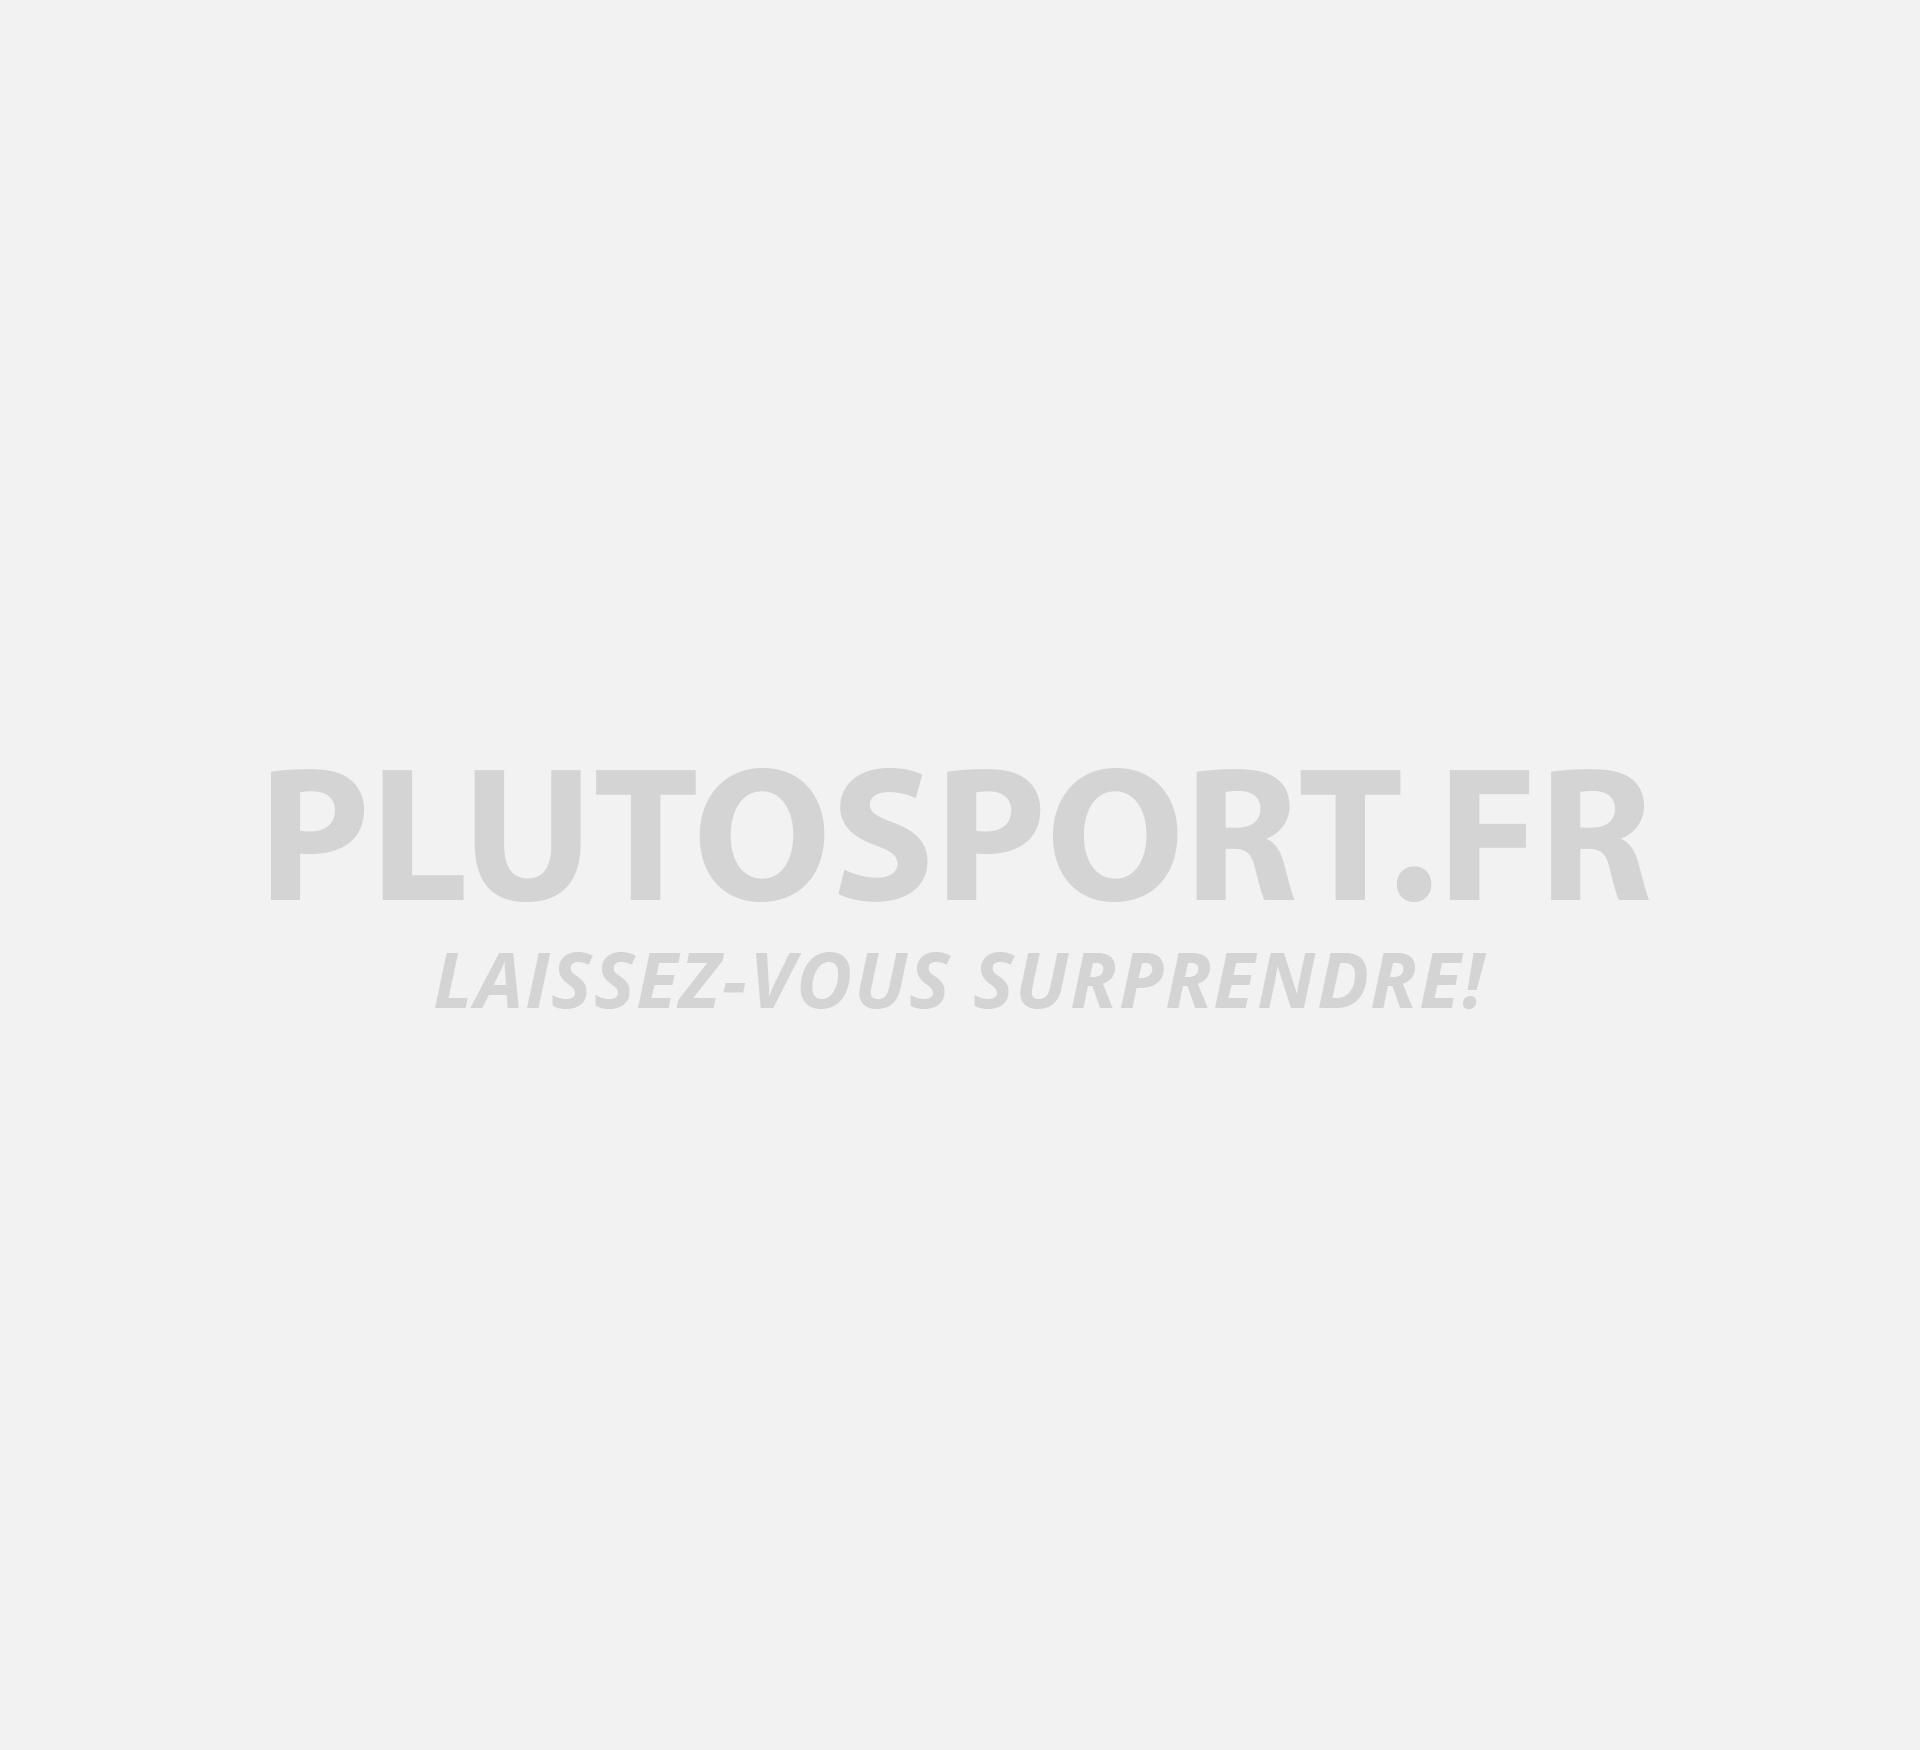 Chaussettes Tommy Hilfiger Iconic Sports Sneaker  (Lot de 6 paires)